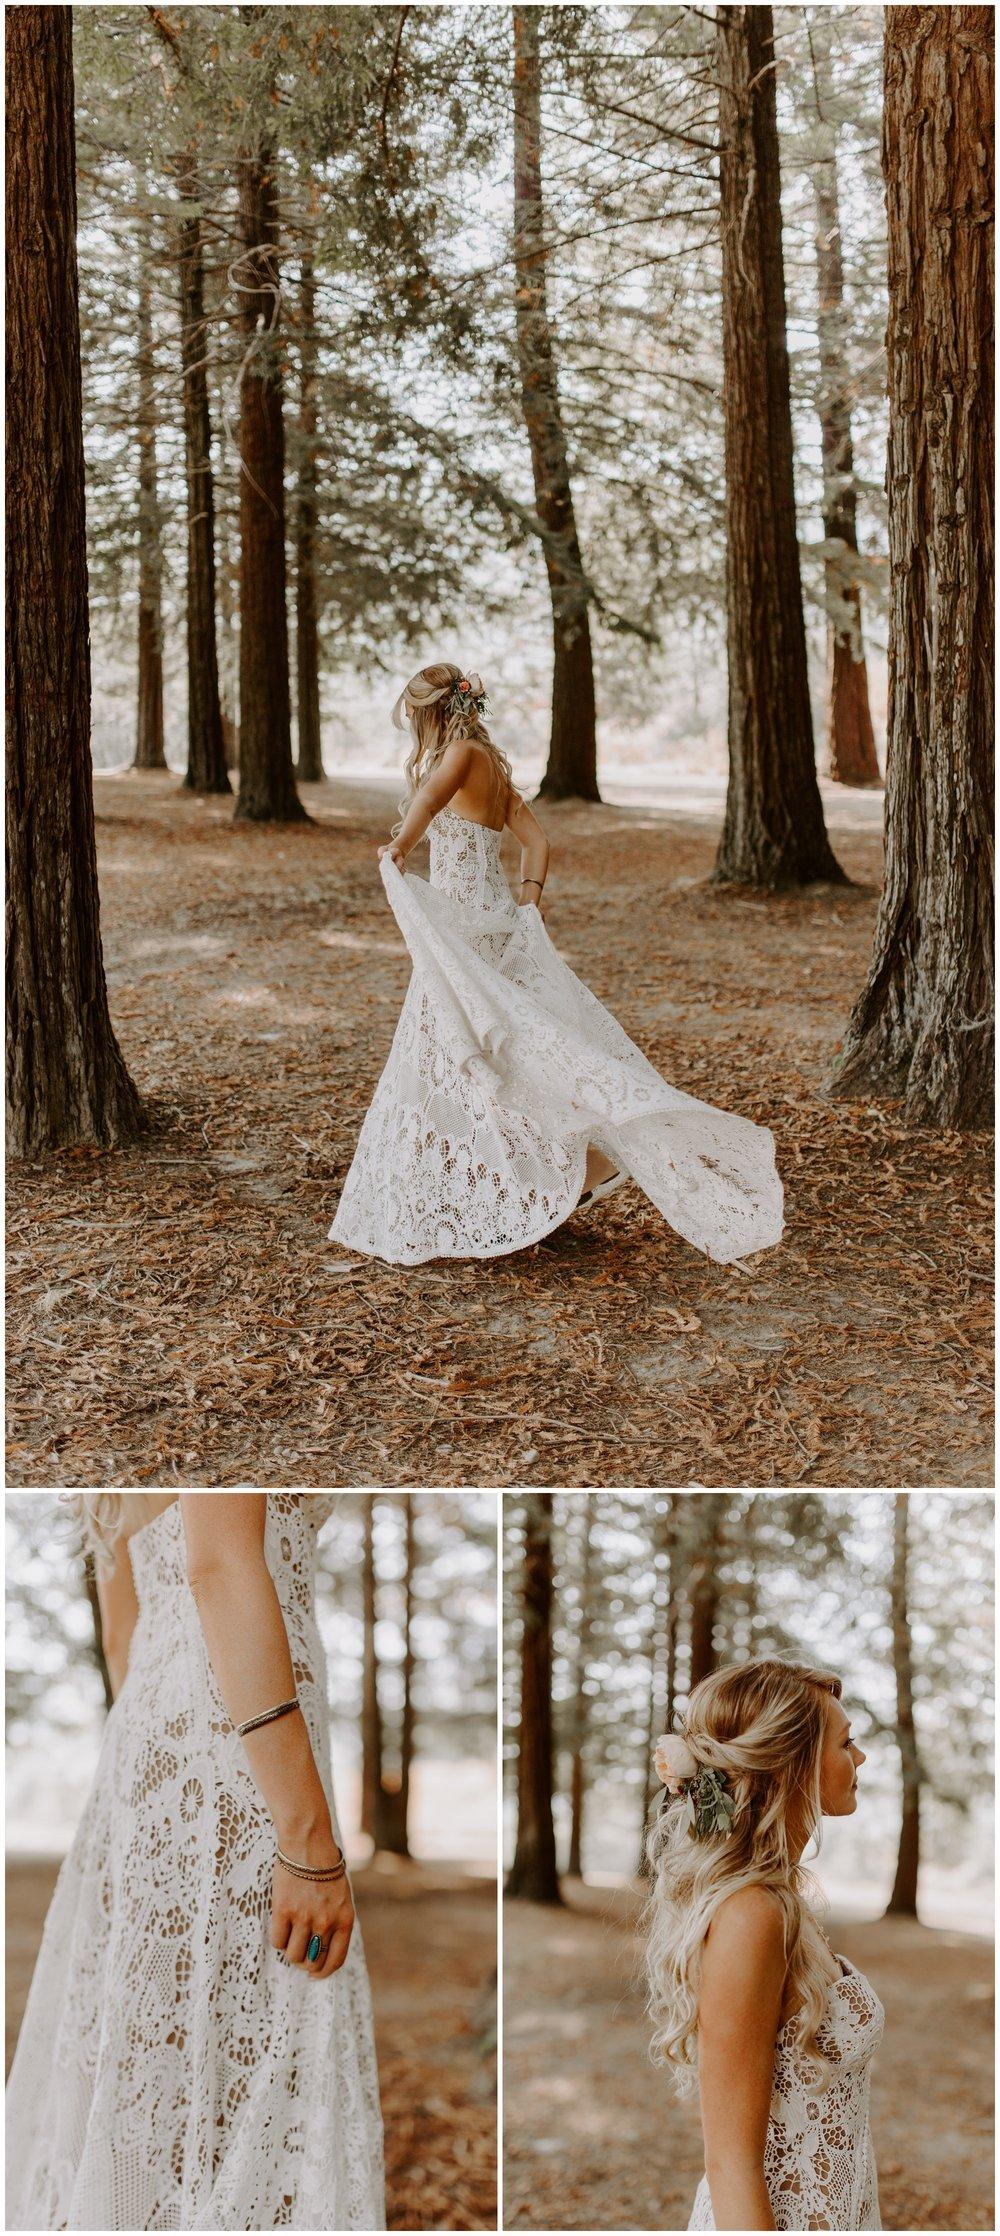 Redwood Festival Wedding Humbolt California - Jessica Heron Images_0018.jpg